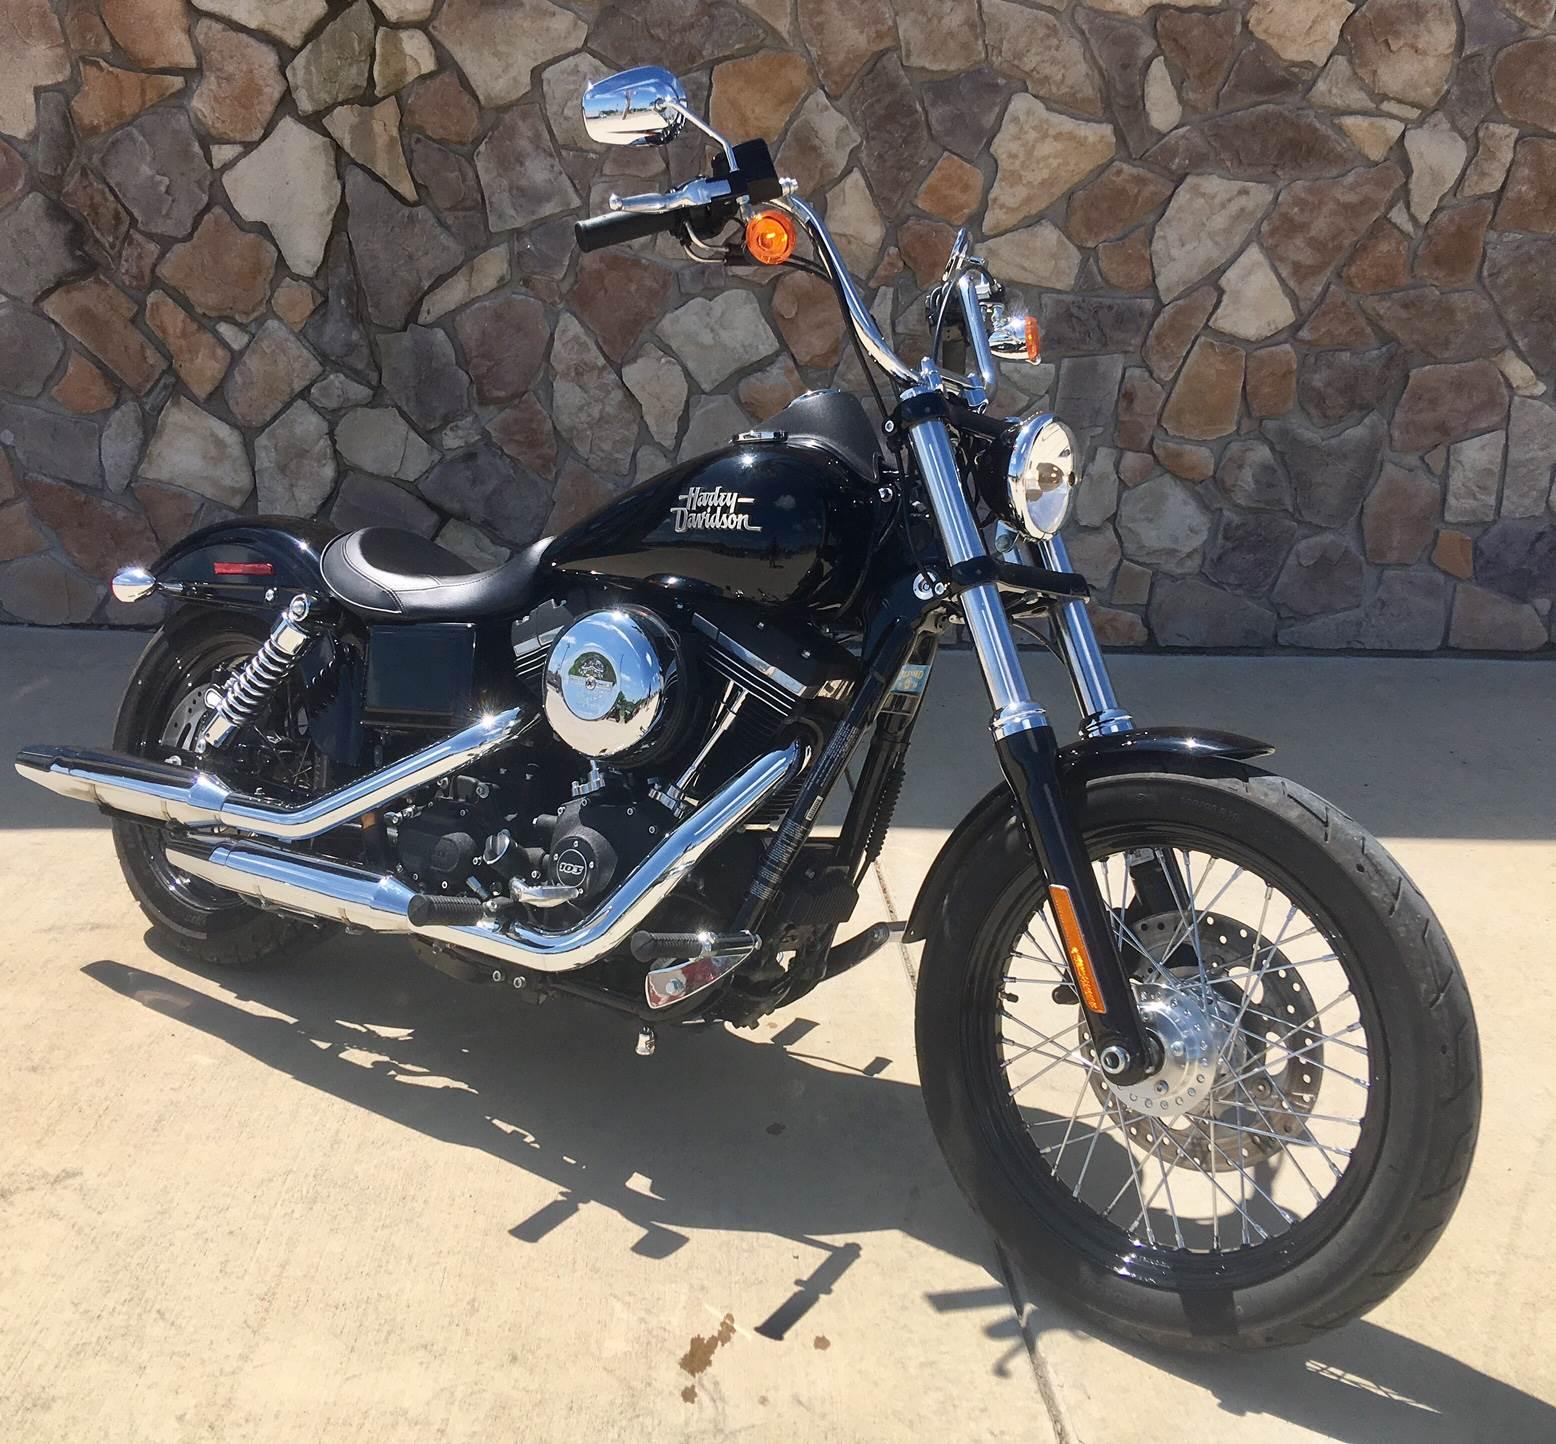 2015 Harley-Davidson Street Bob for sale 3650